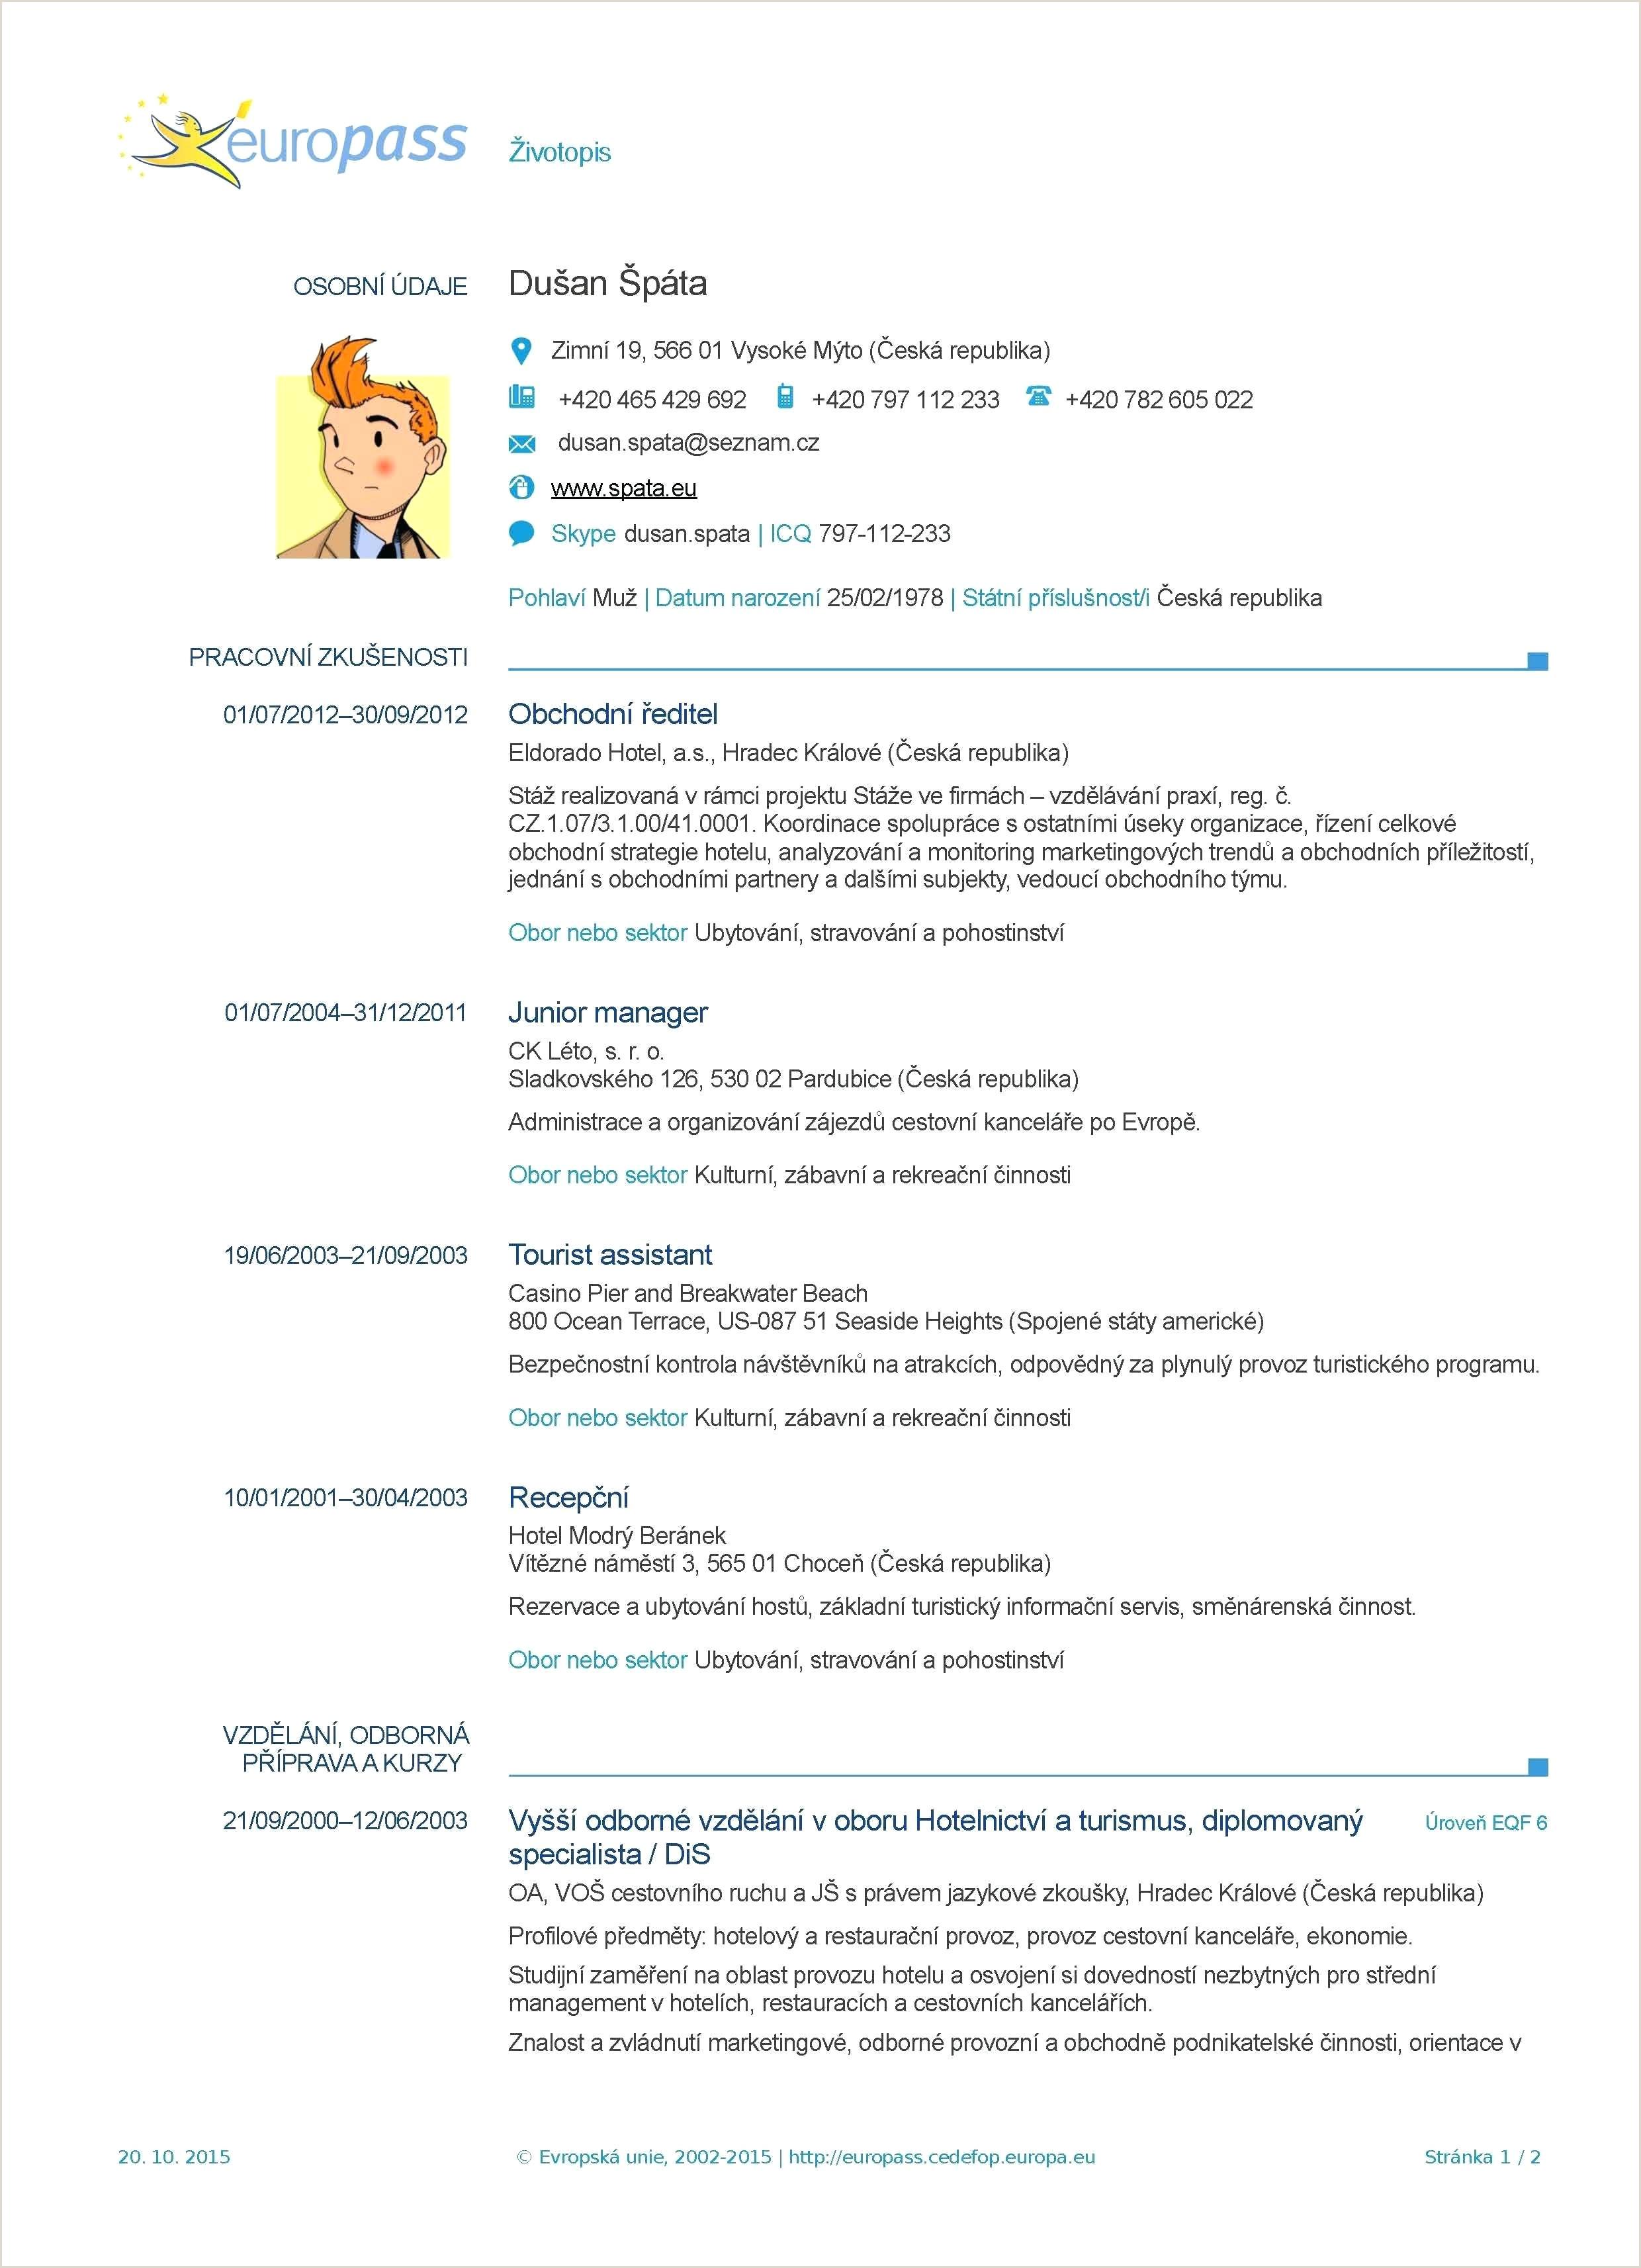 Europass Cv format Download Free Template Skills Resume List Examples Europass Cv